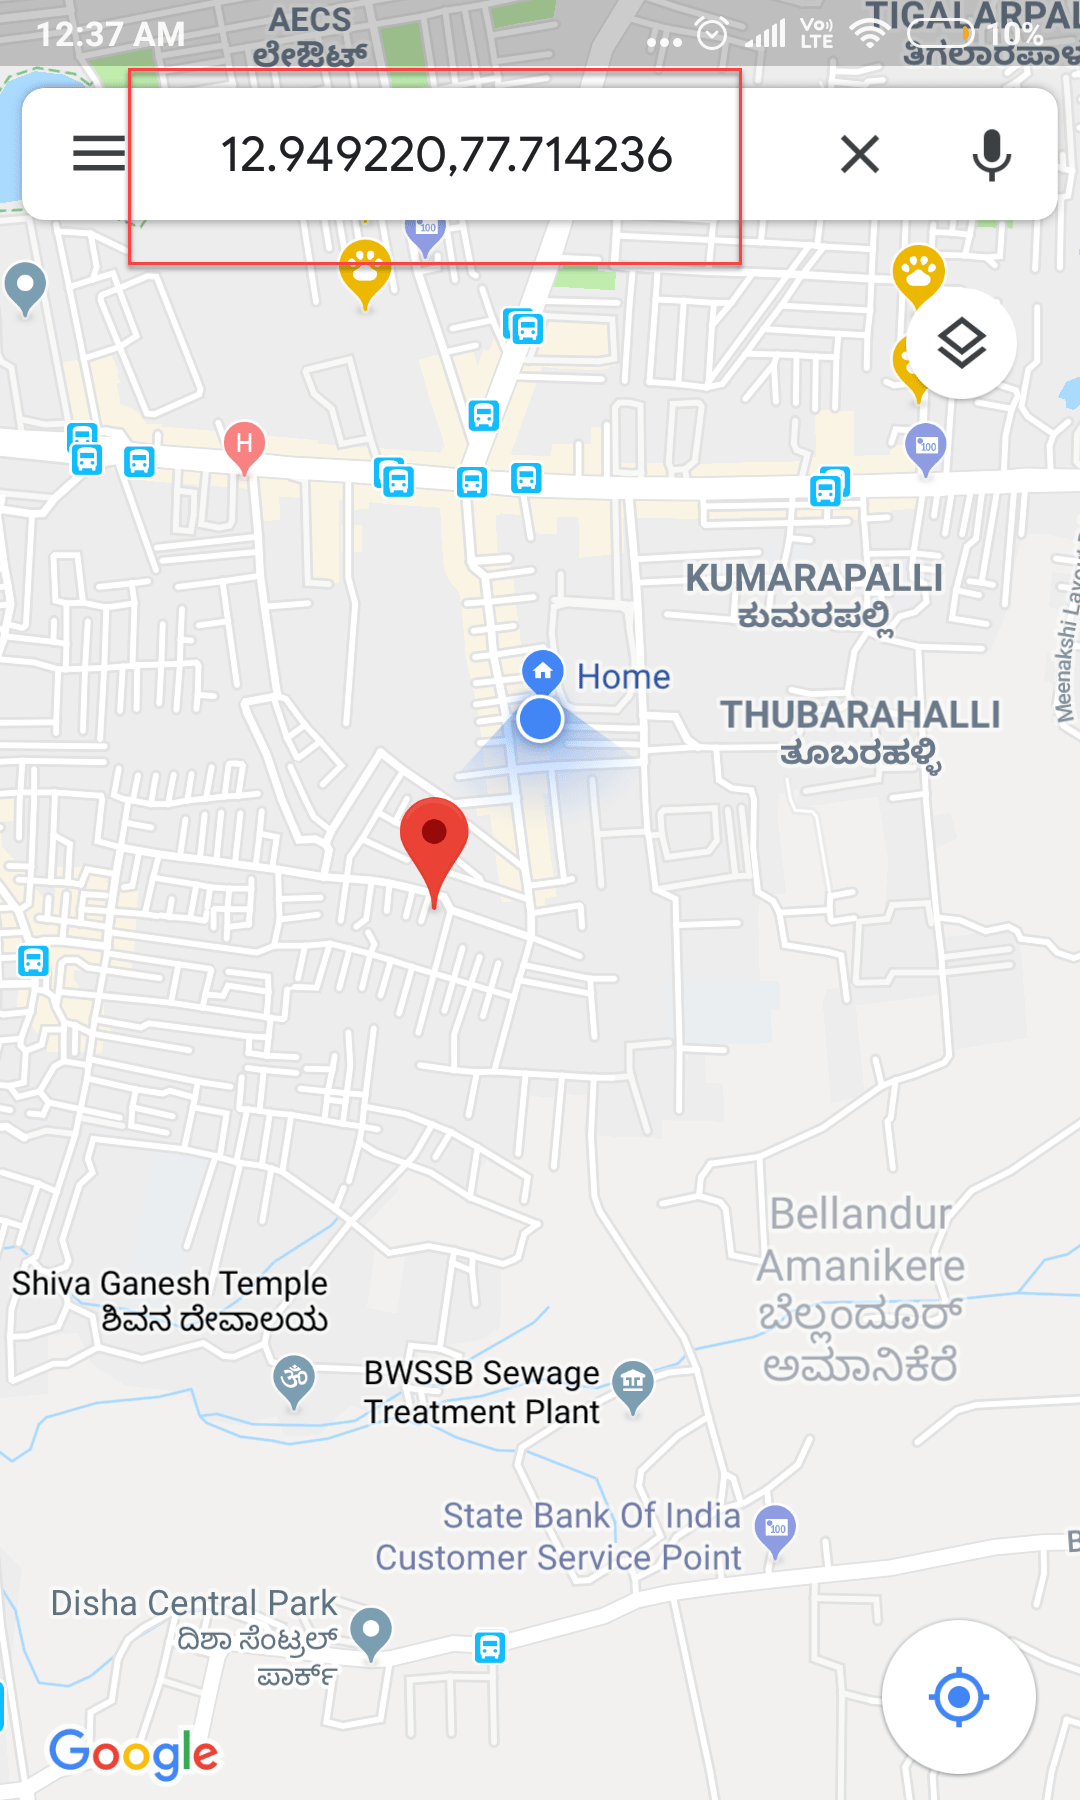 Find GPS Coordinates using Google Maps Application